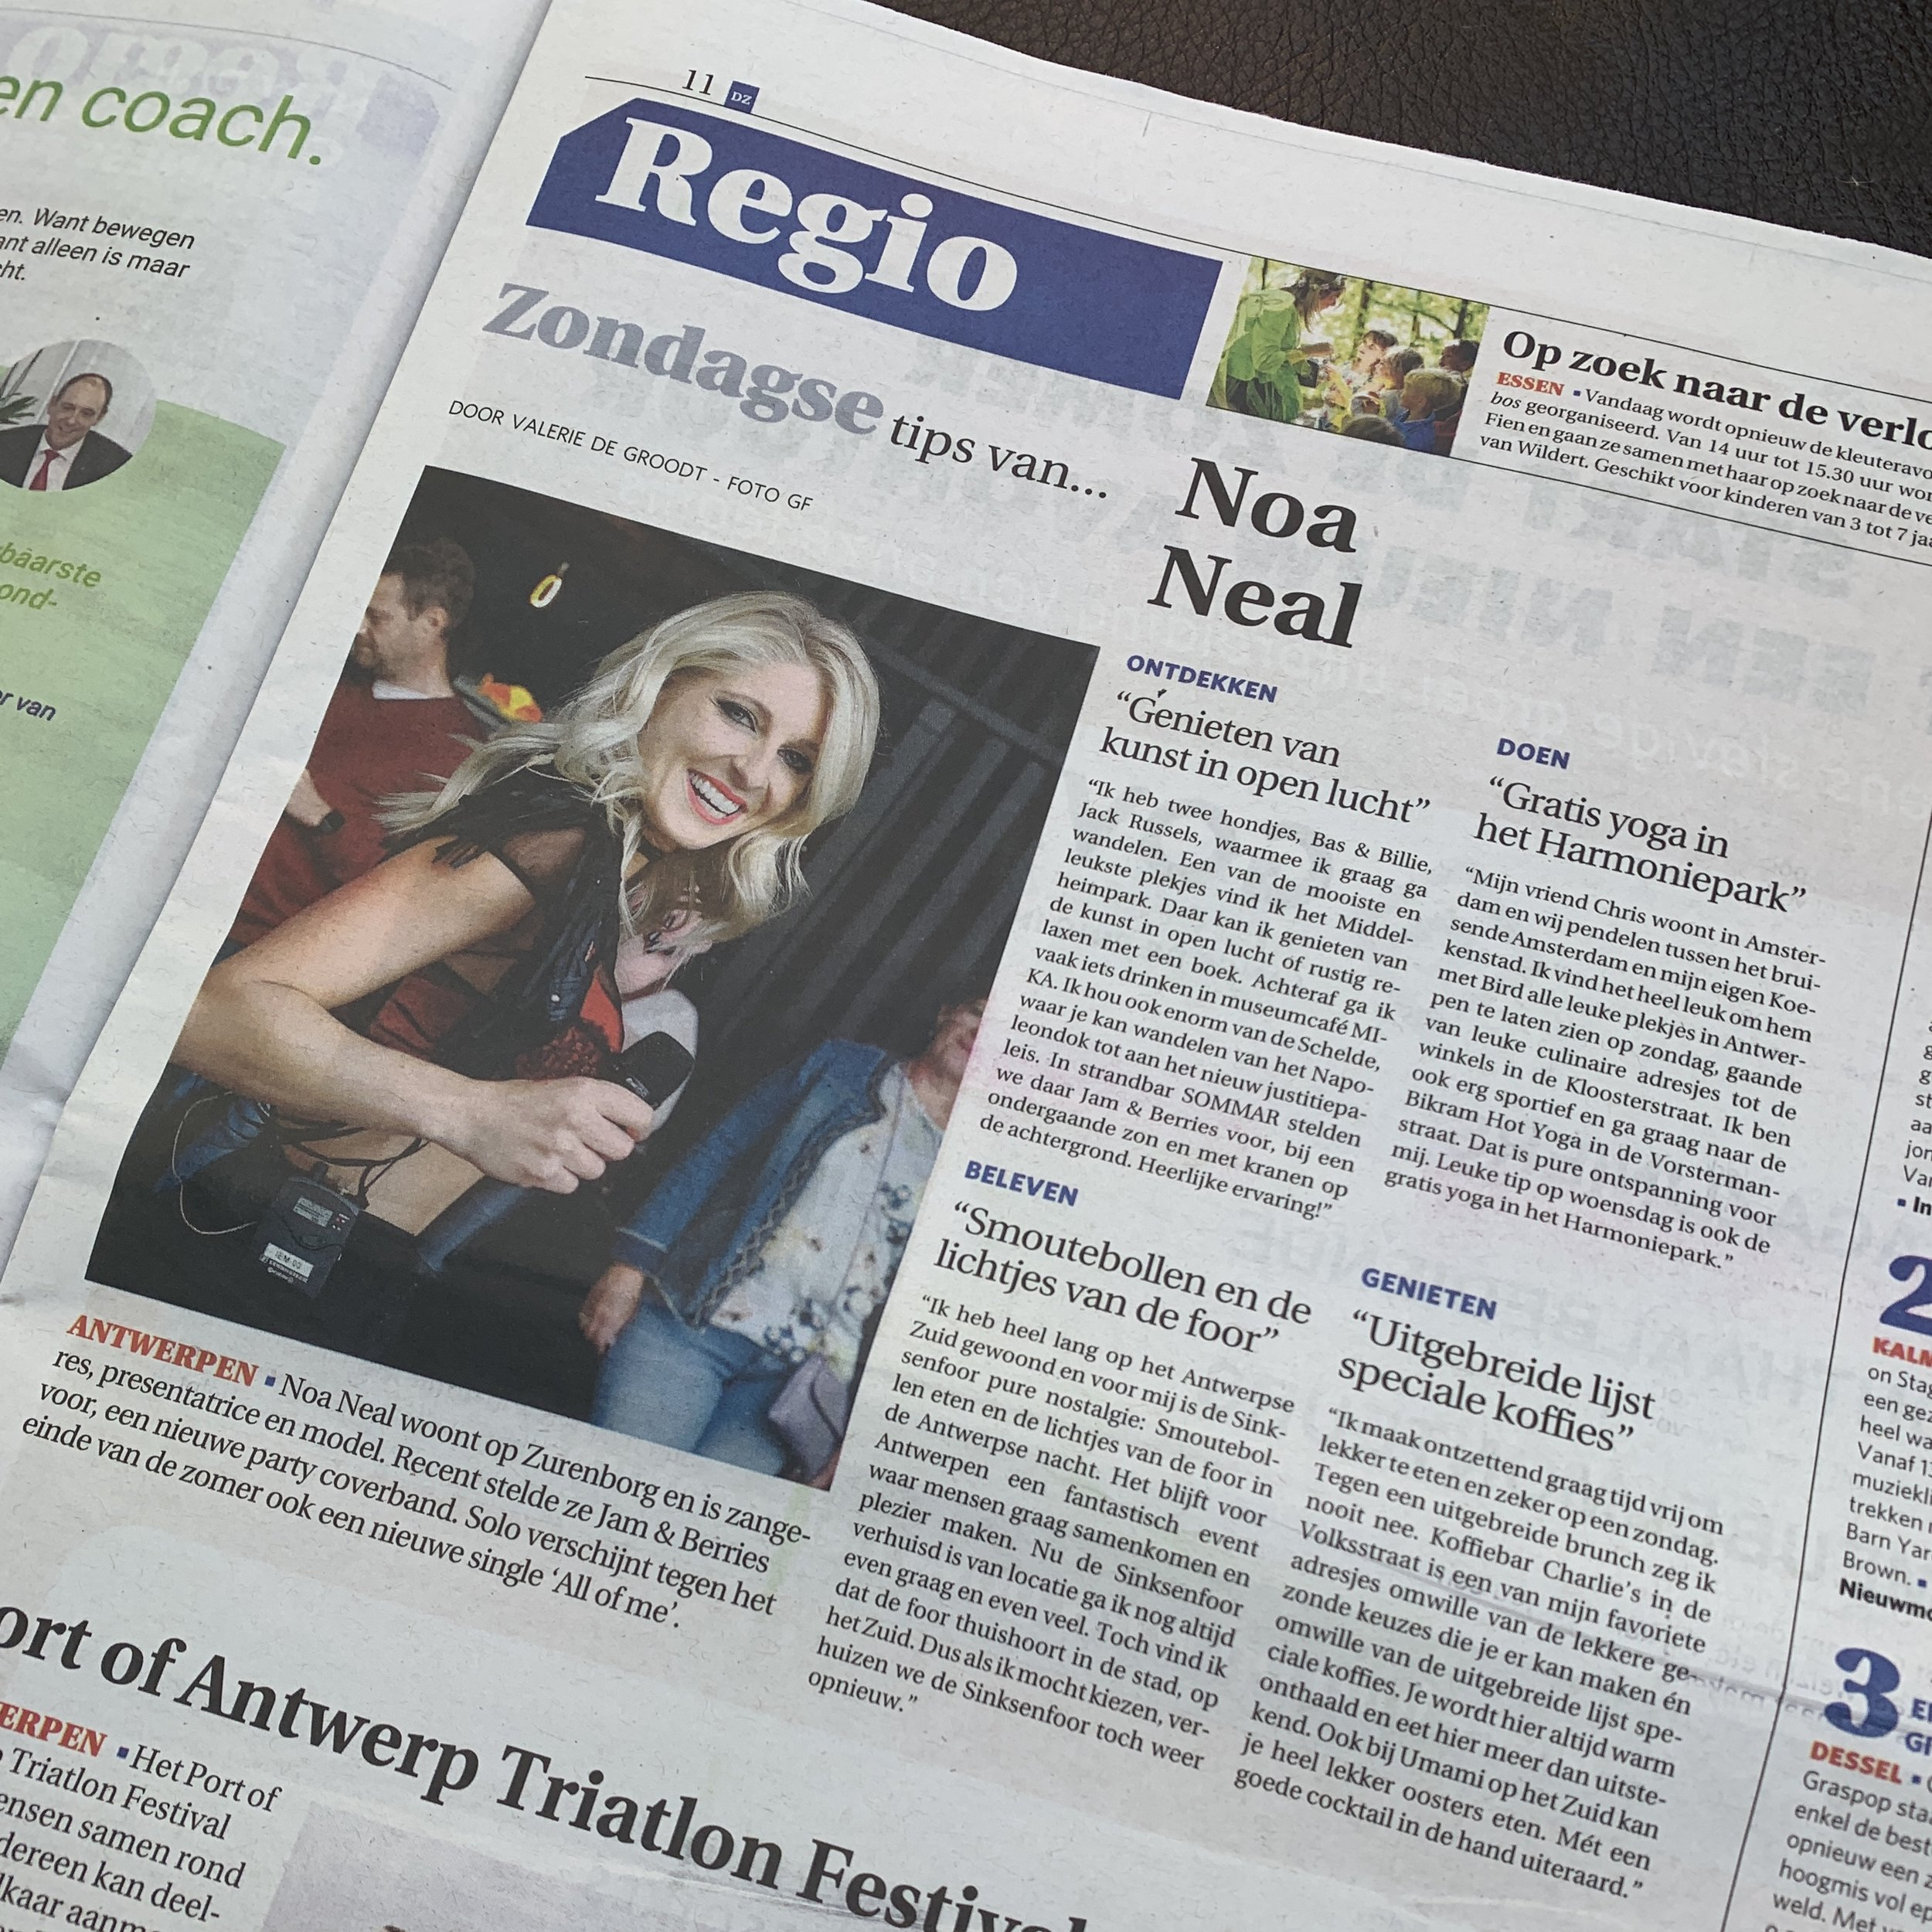 De zondag interview krant